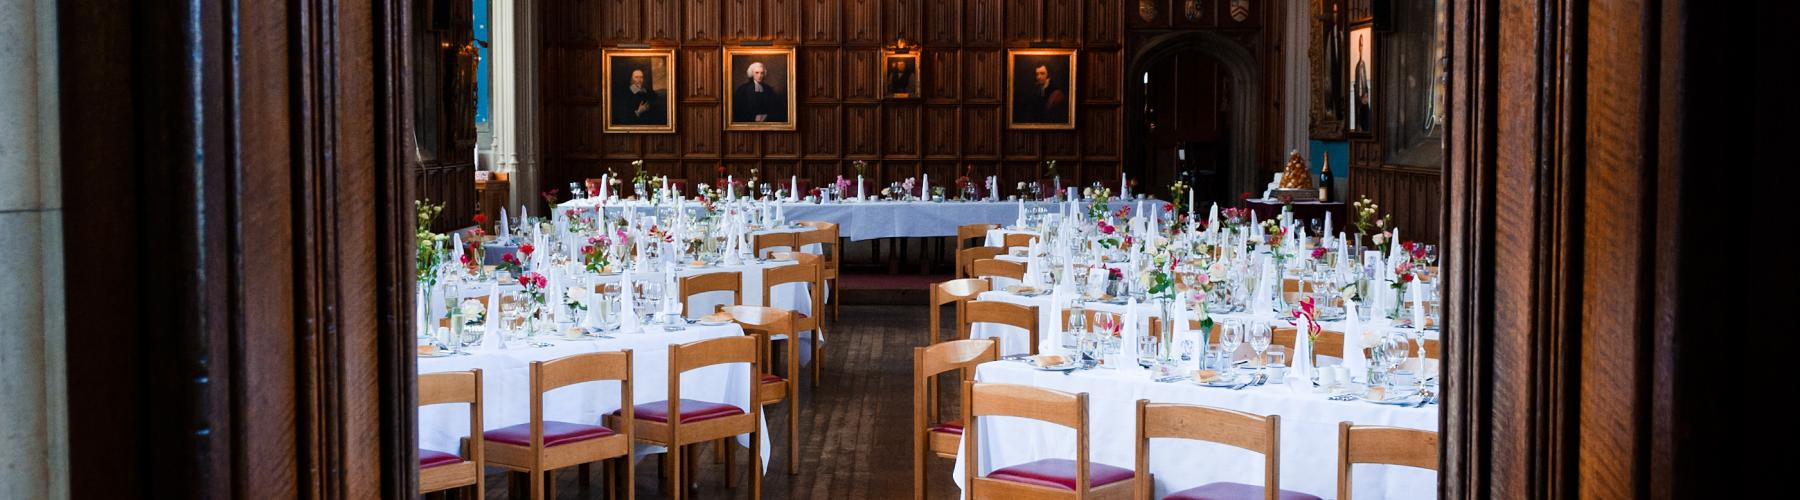 Weddings At Corpus Cambridge Corpus Christi College University Of